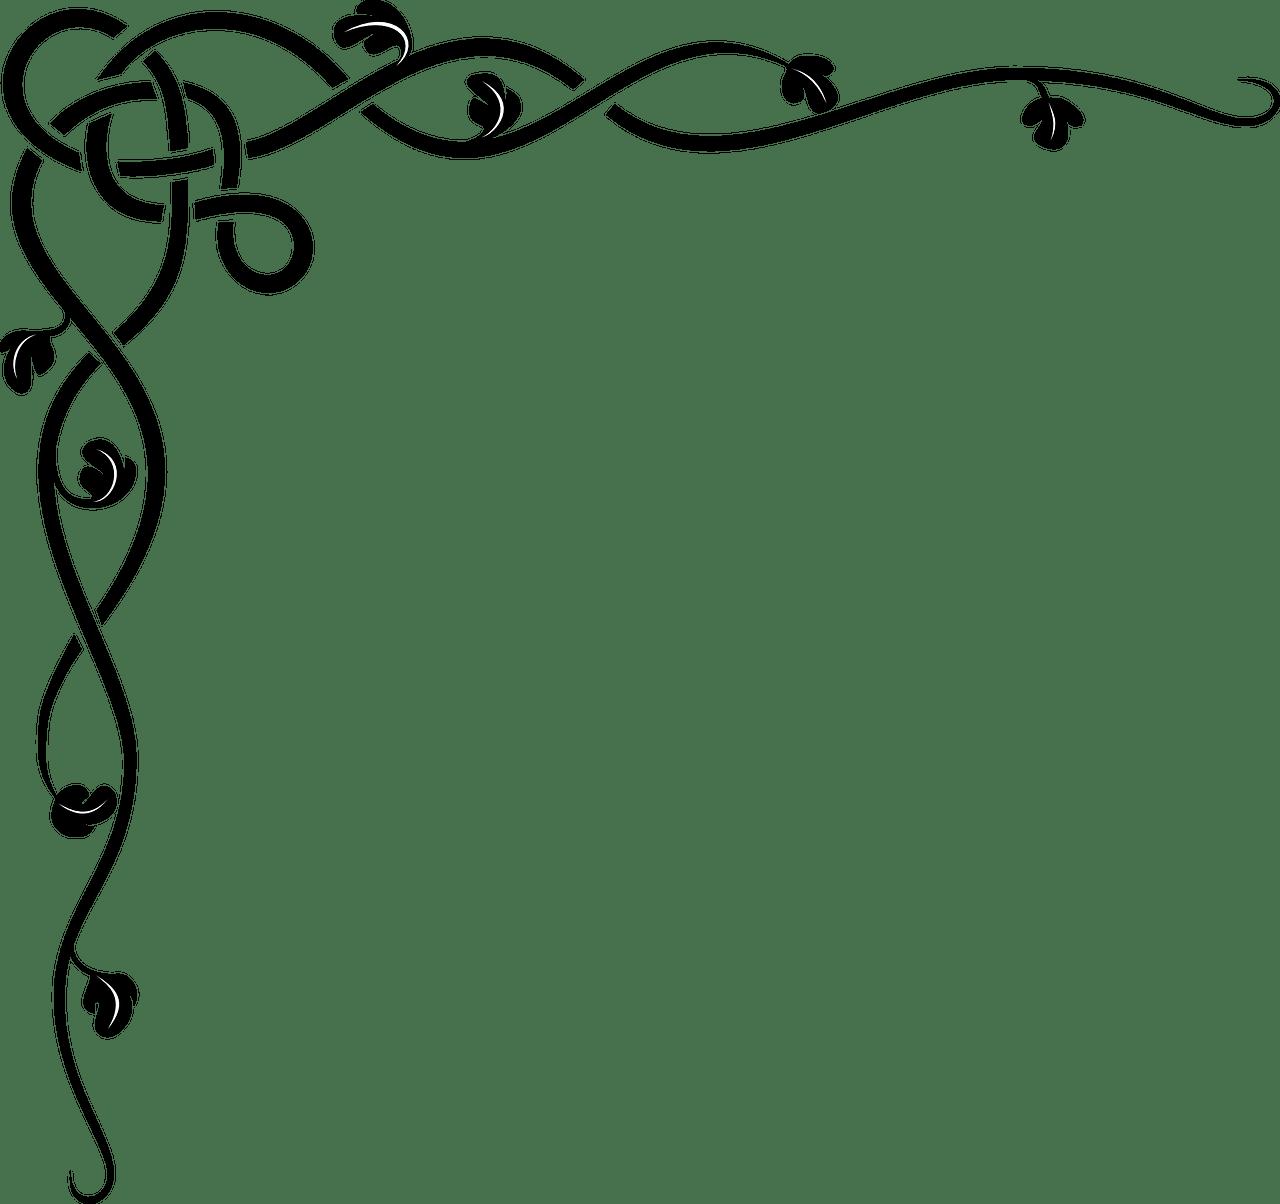 Flourish clipart title border, Flourish title border